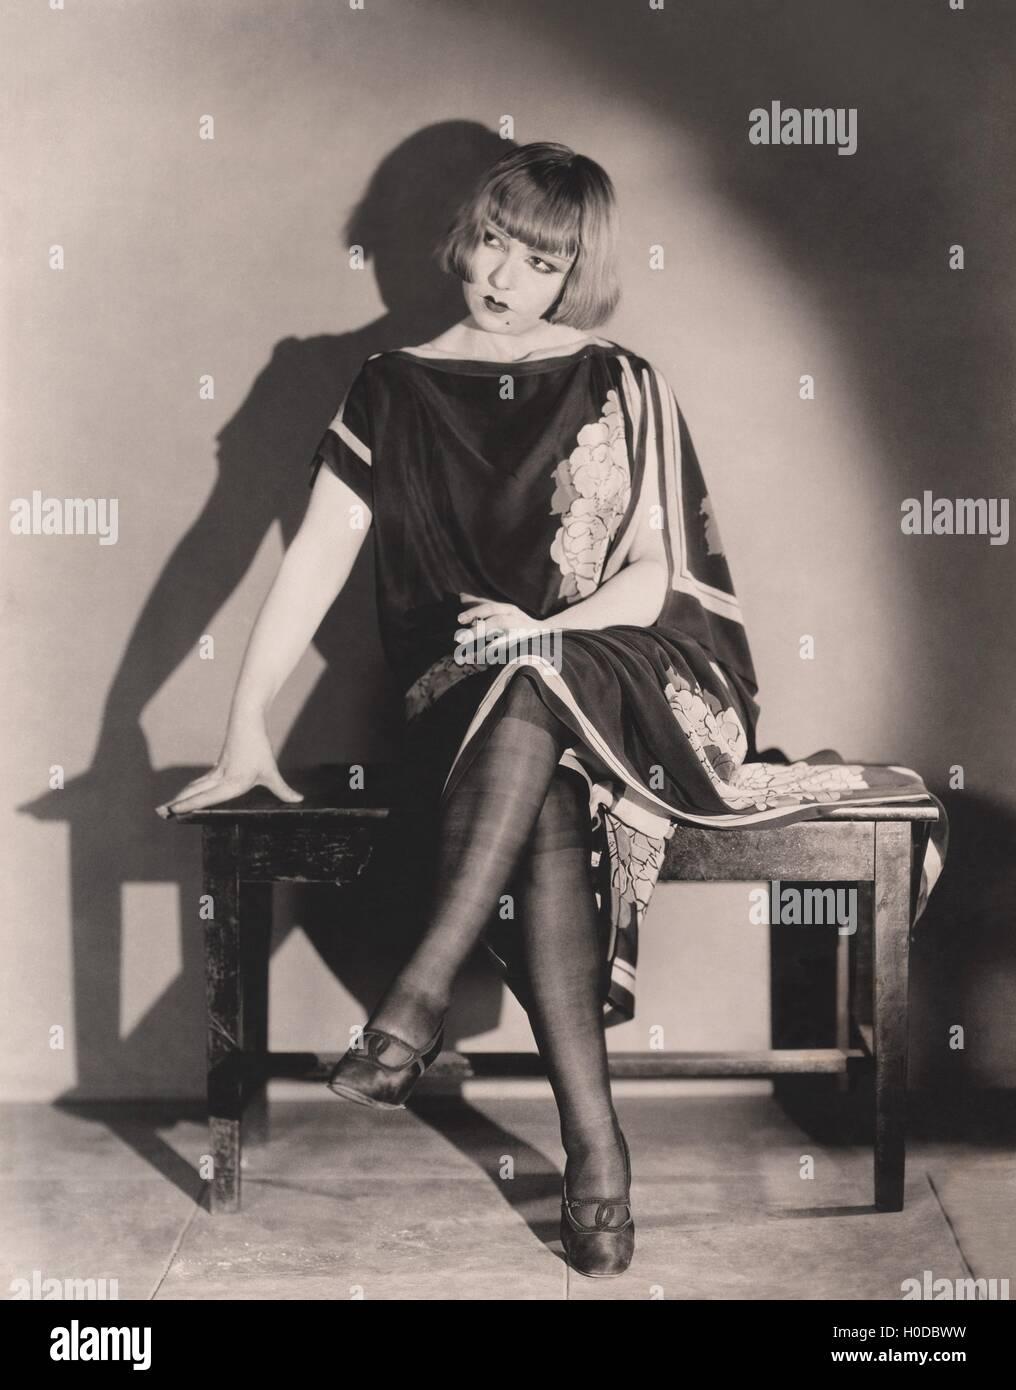 Fashionable woman sitting on piano bench Stock Photo